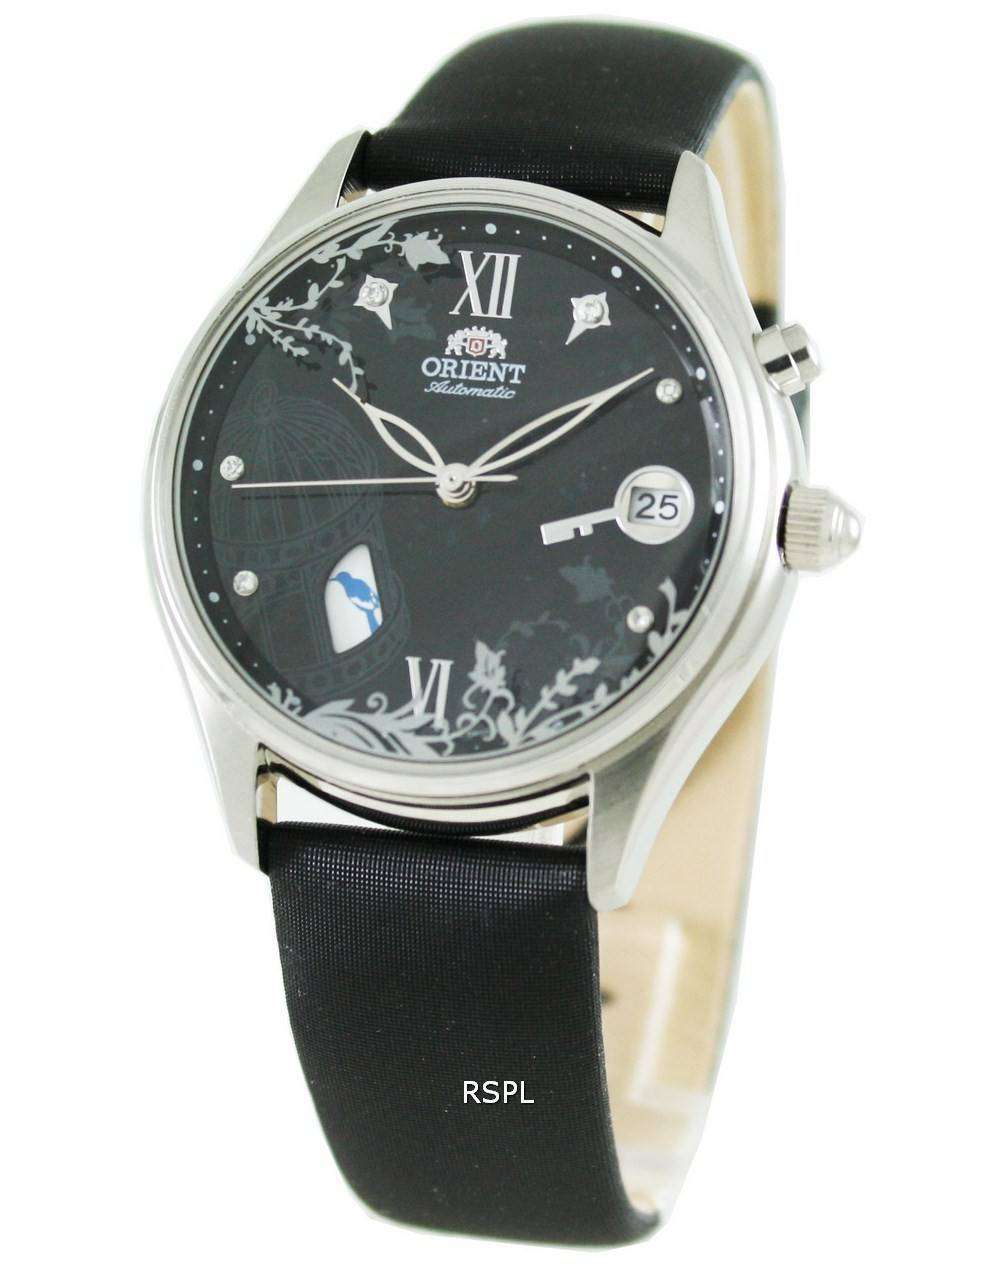 Hamilton Jazzmaster H32315851 Women's Watch , watches. Seiko 5 Sports Ladies Automatic ... VINTAGE SHARP TWO TONE QUARTZ JAPAN MEN WATCH